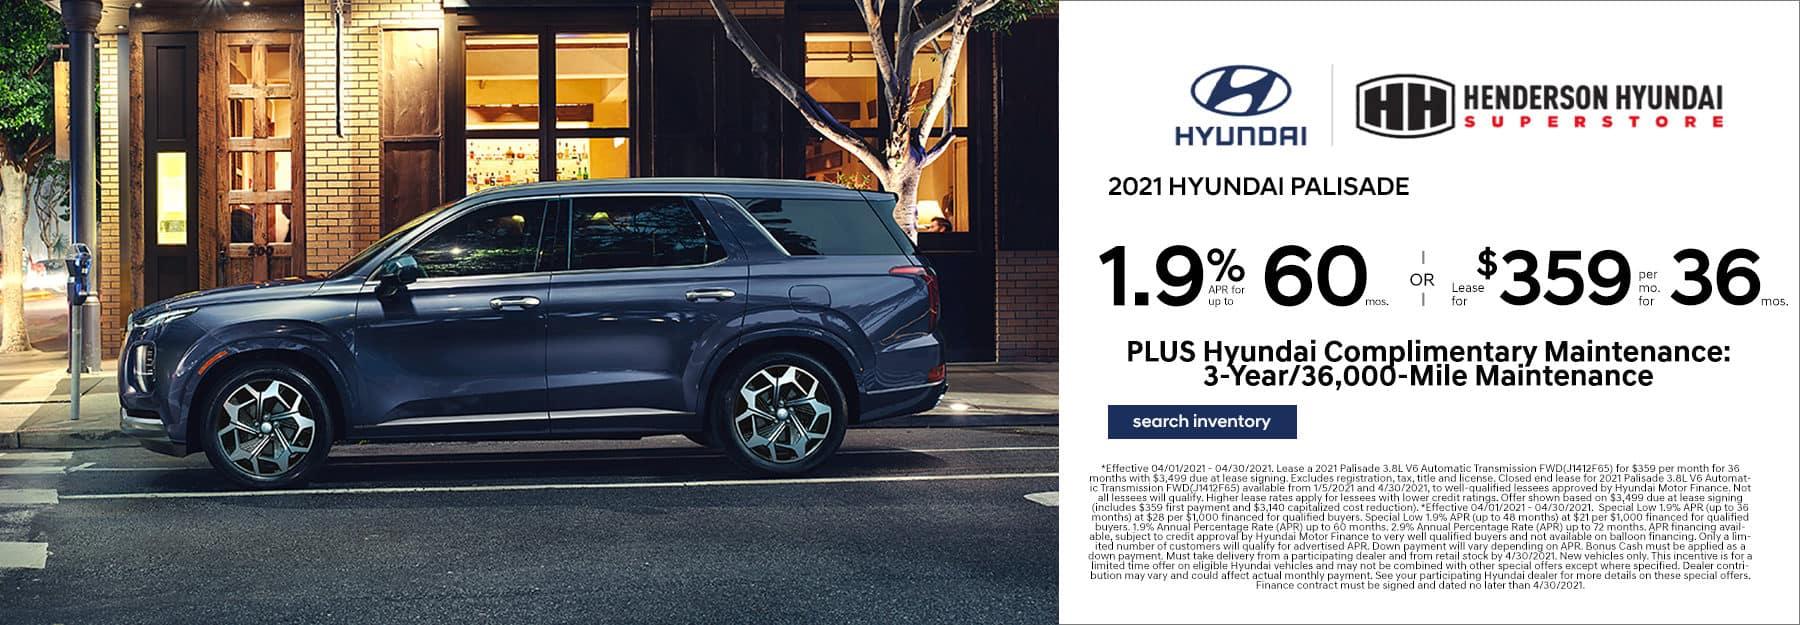 R_April_2021_Palisade_Henderson Hyundai